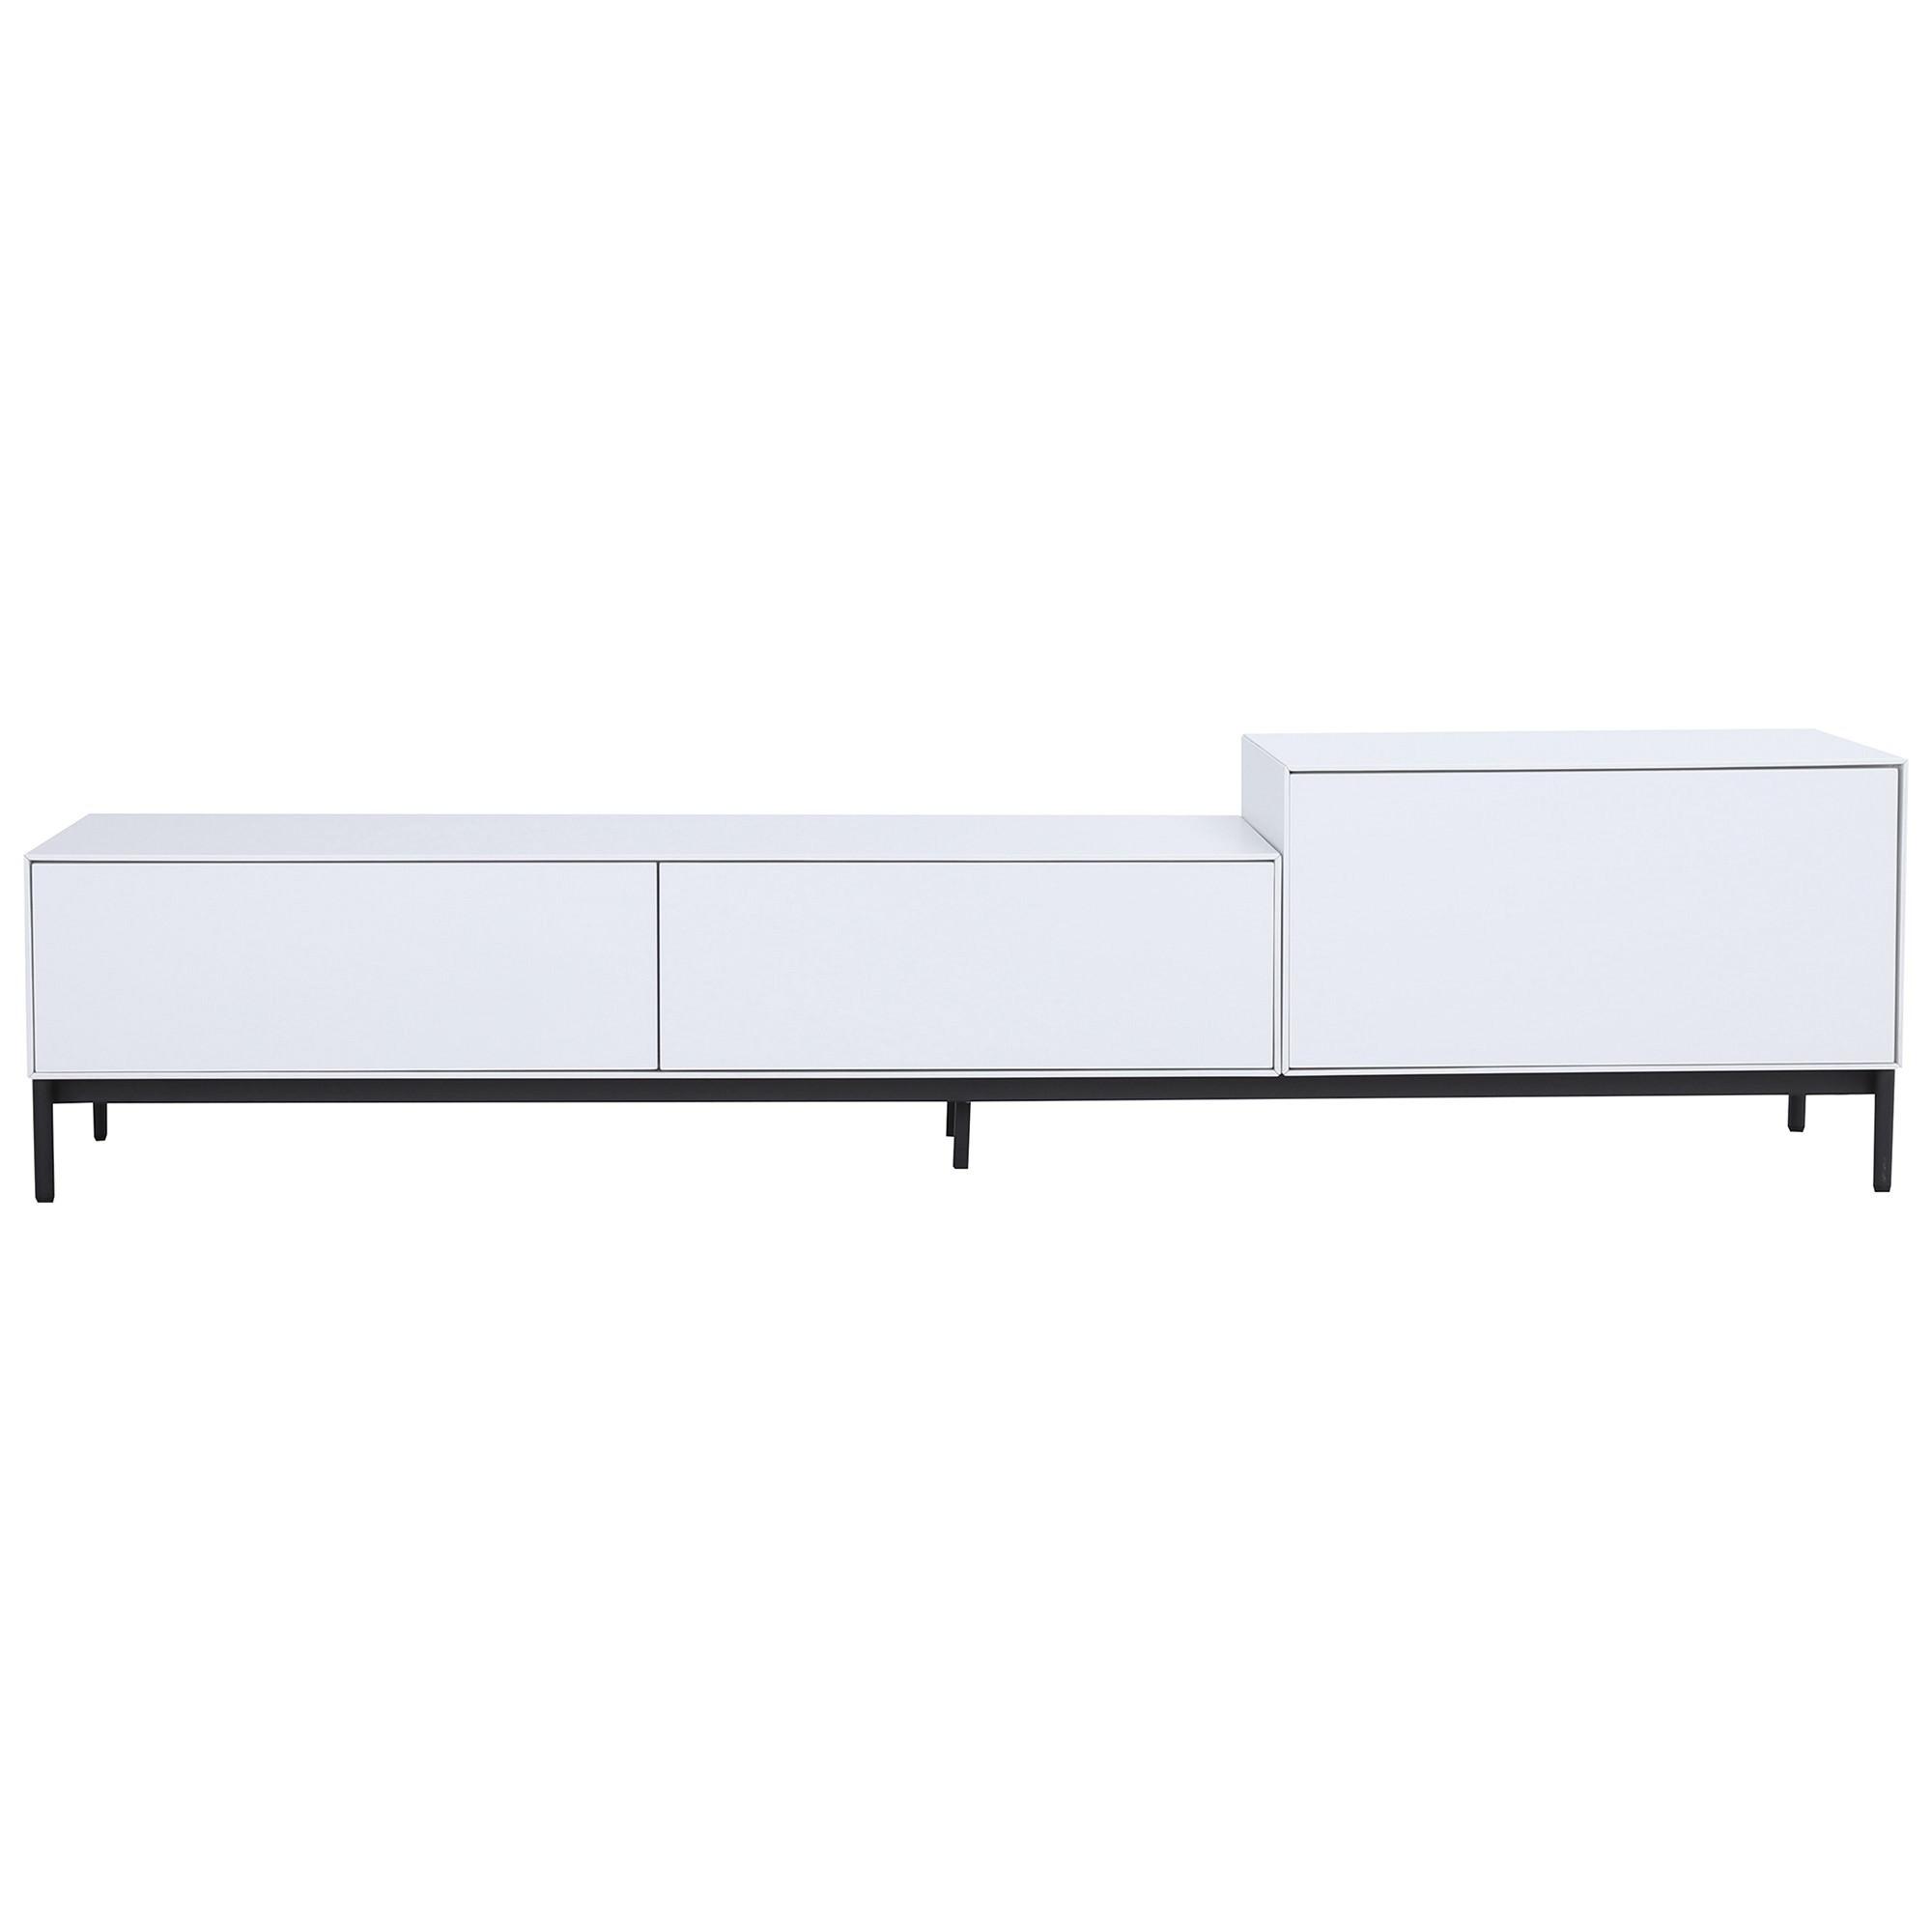 Lowell 3 Drawer TV Unit, 180cm, White